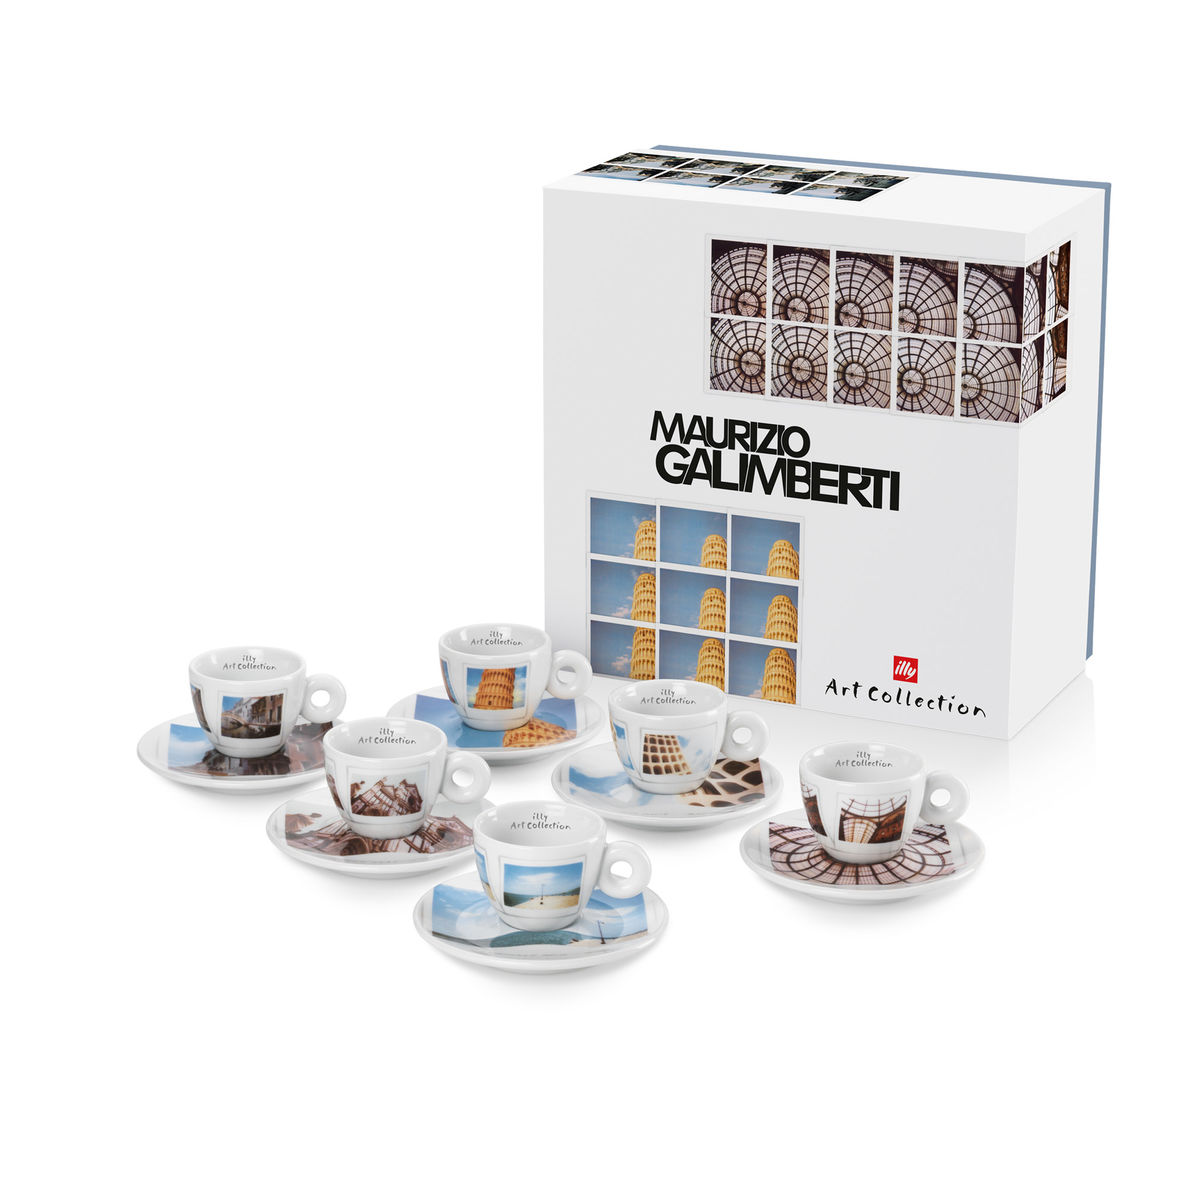 Illy Maurizio Galimberti Espresso Cups & Saucer (box/6pcs)